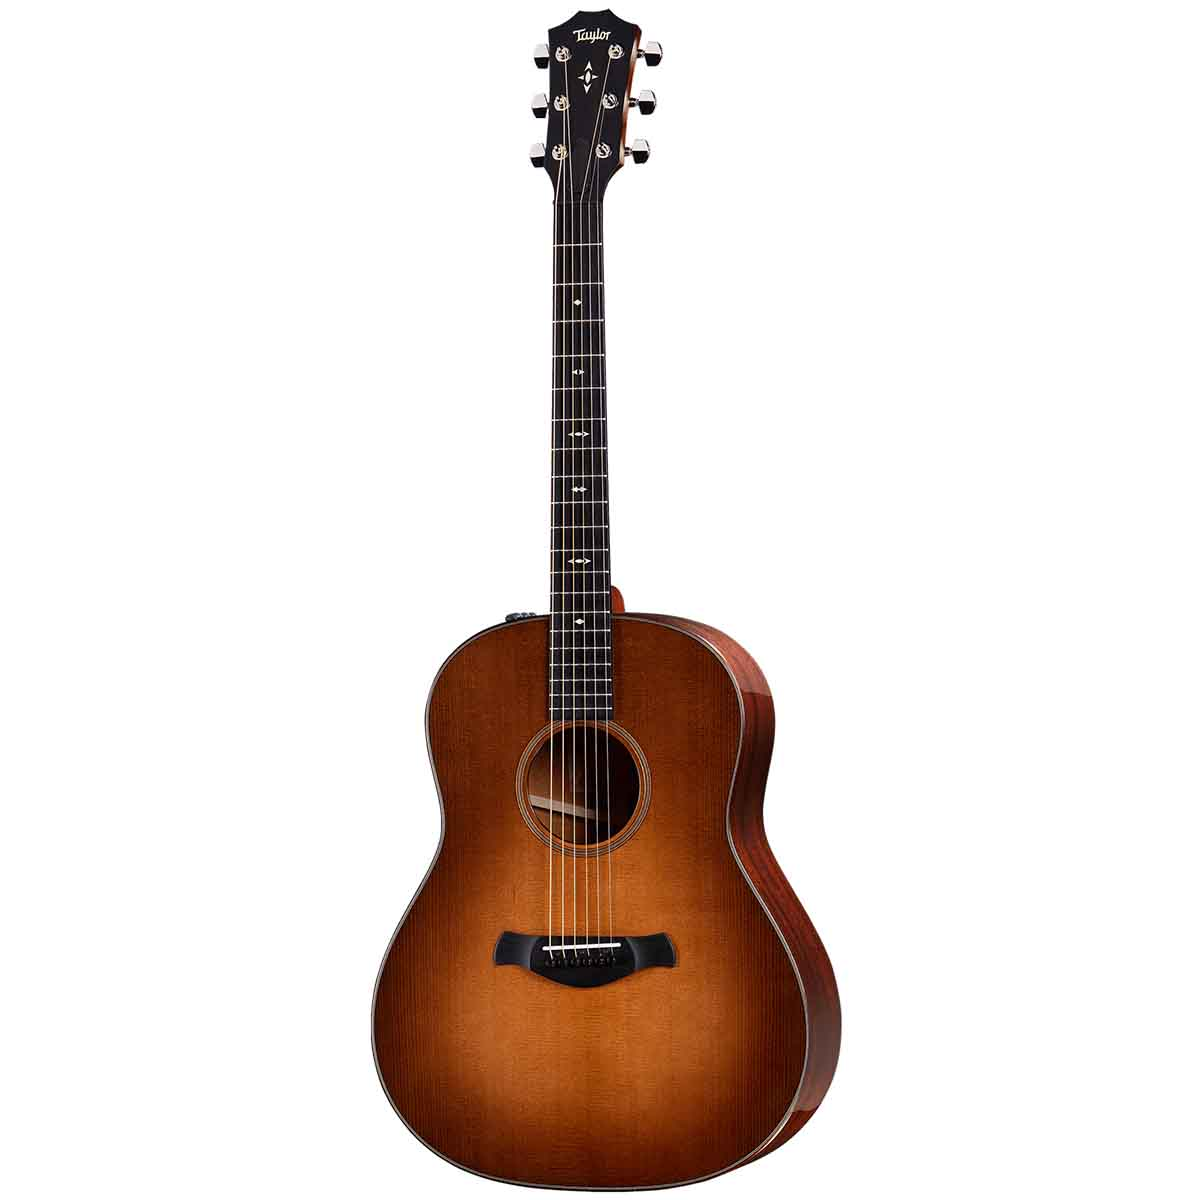 Taylor Builders Edition 517e WHB western-guitar wild honey burst